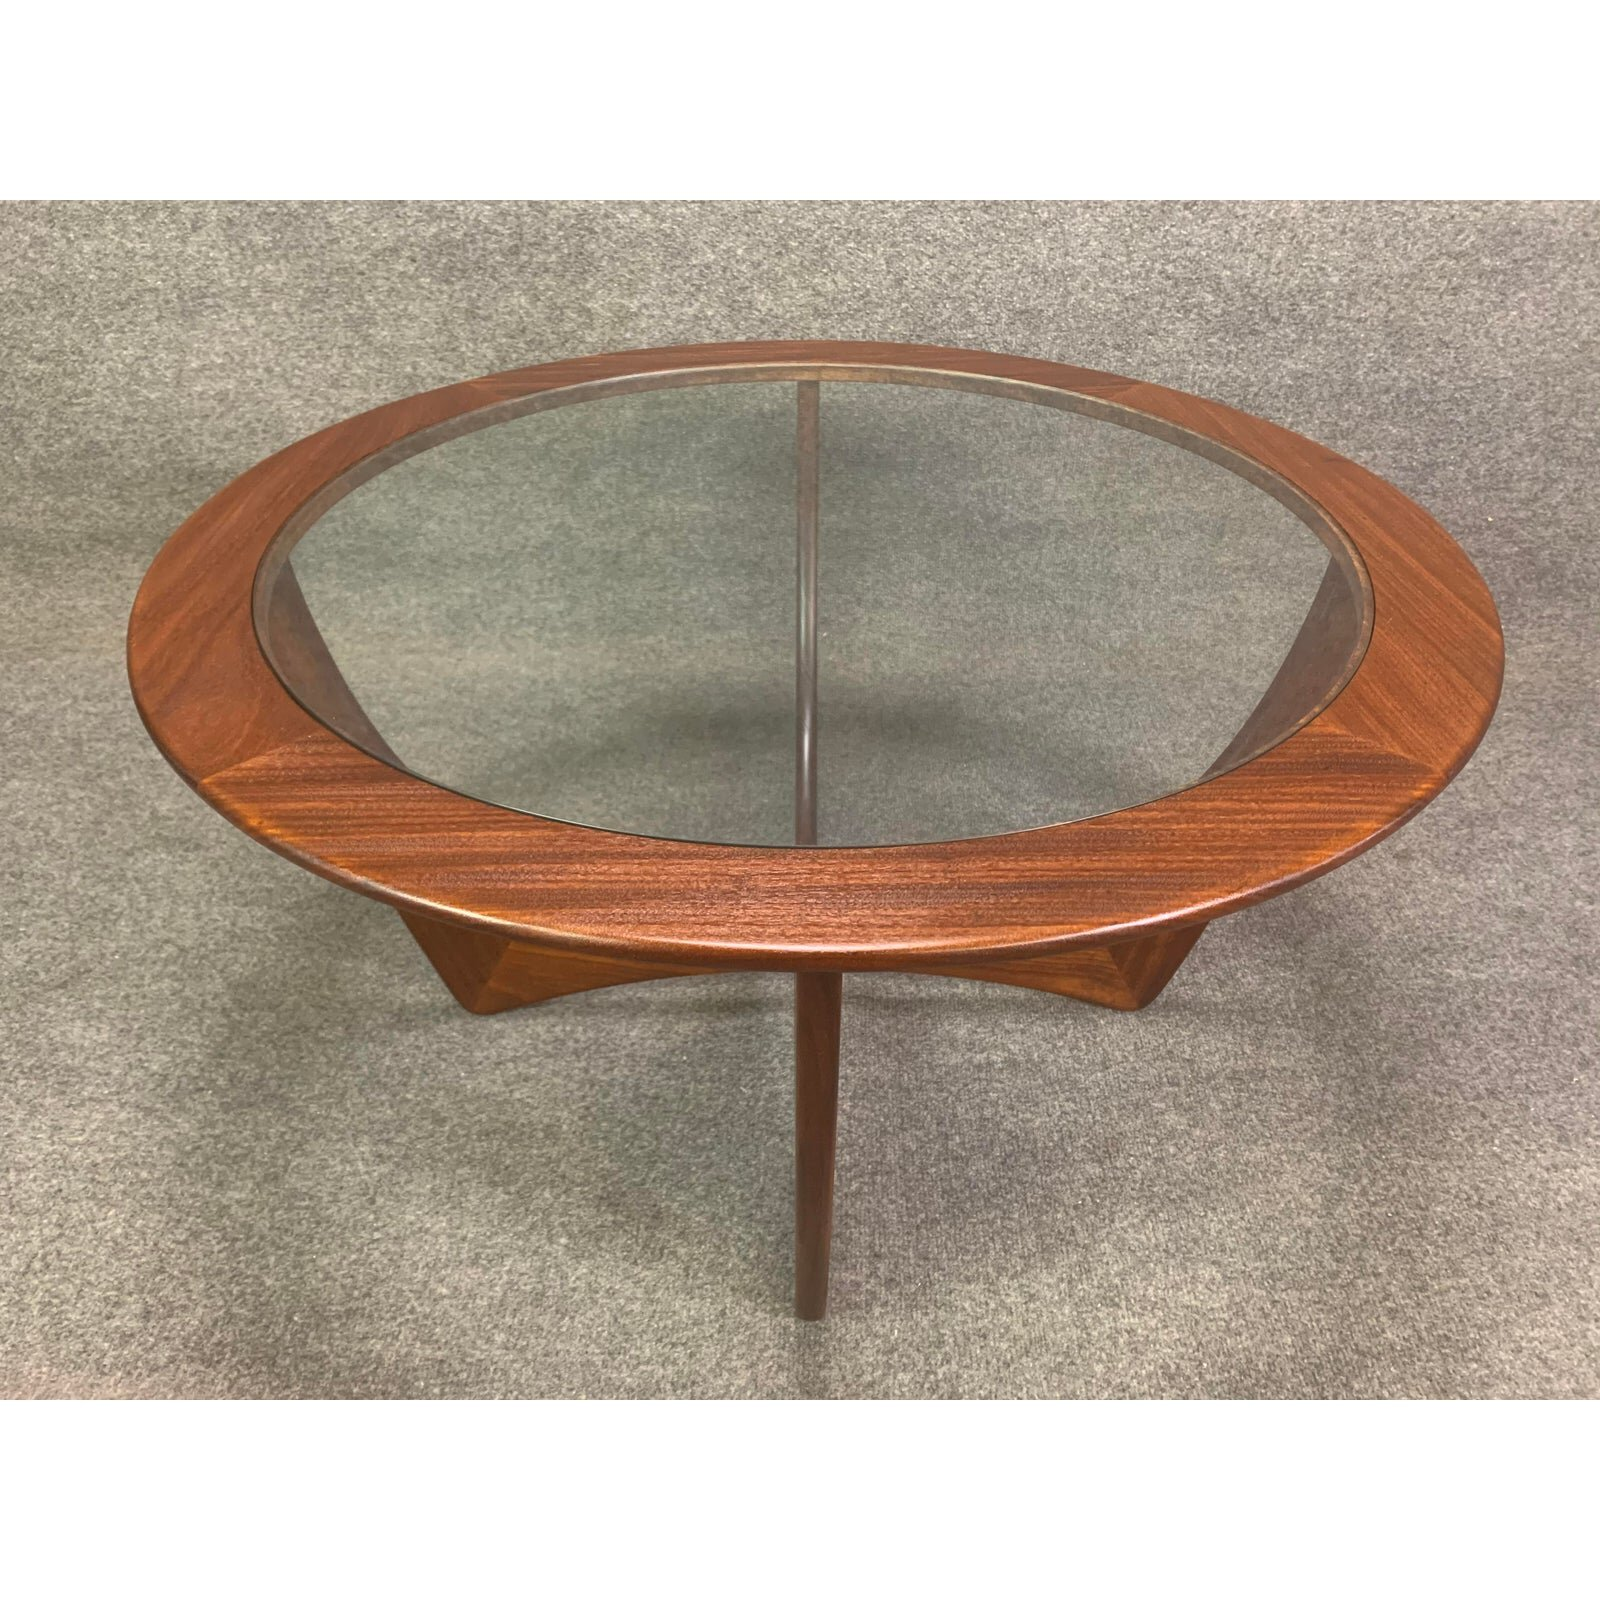 vintage british mid century modern teak astro coffee table by g plan aymerick modern